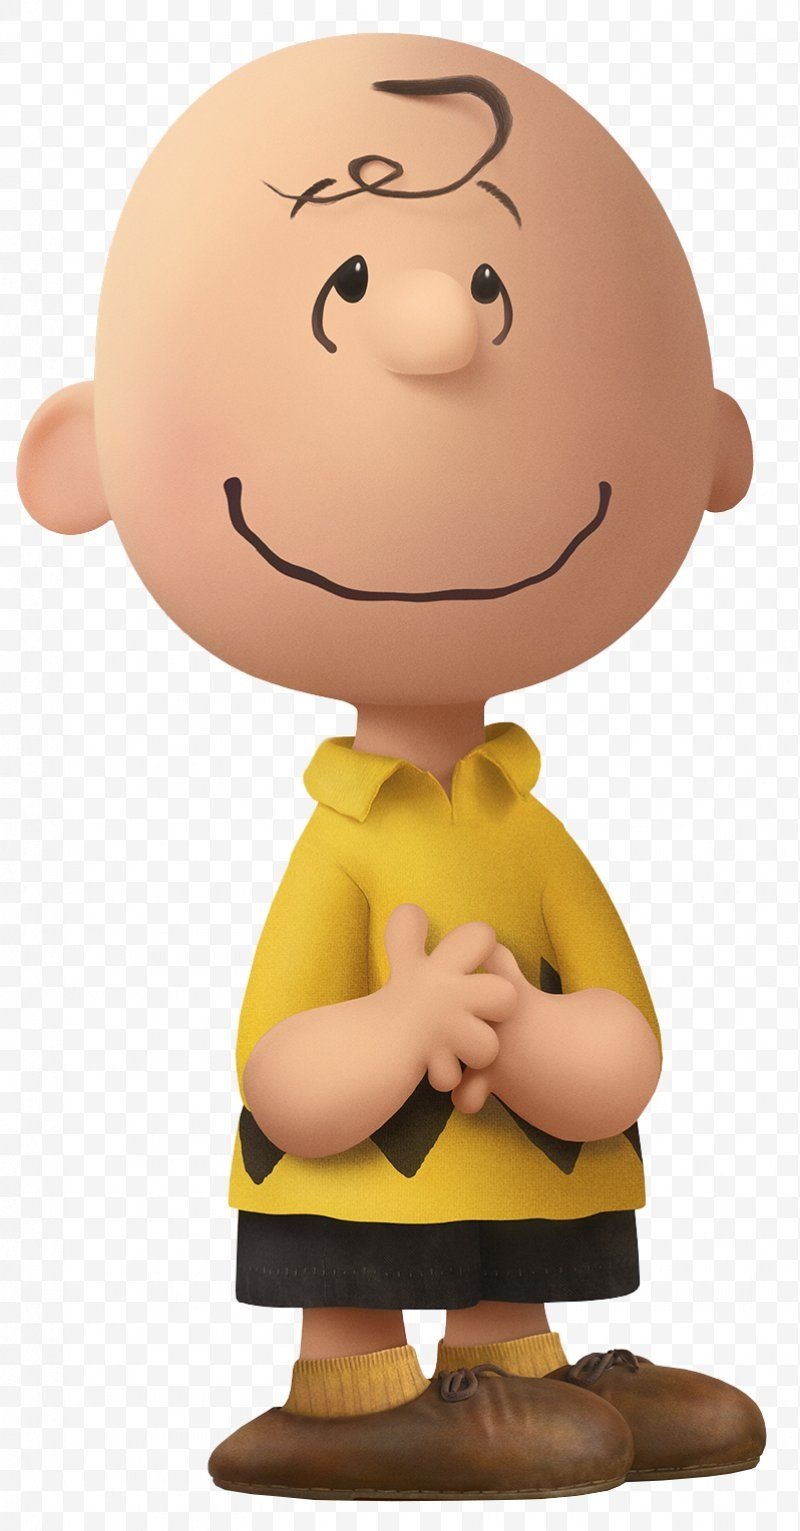 Charlie Brown The Peanuts Movie Transparent Cartoon Charlie Brown Snoopy Linus Van Charlie Brown Characters Charlie Brown Movie Peanuts Charlie Brown Snoopy